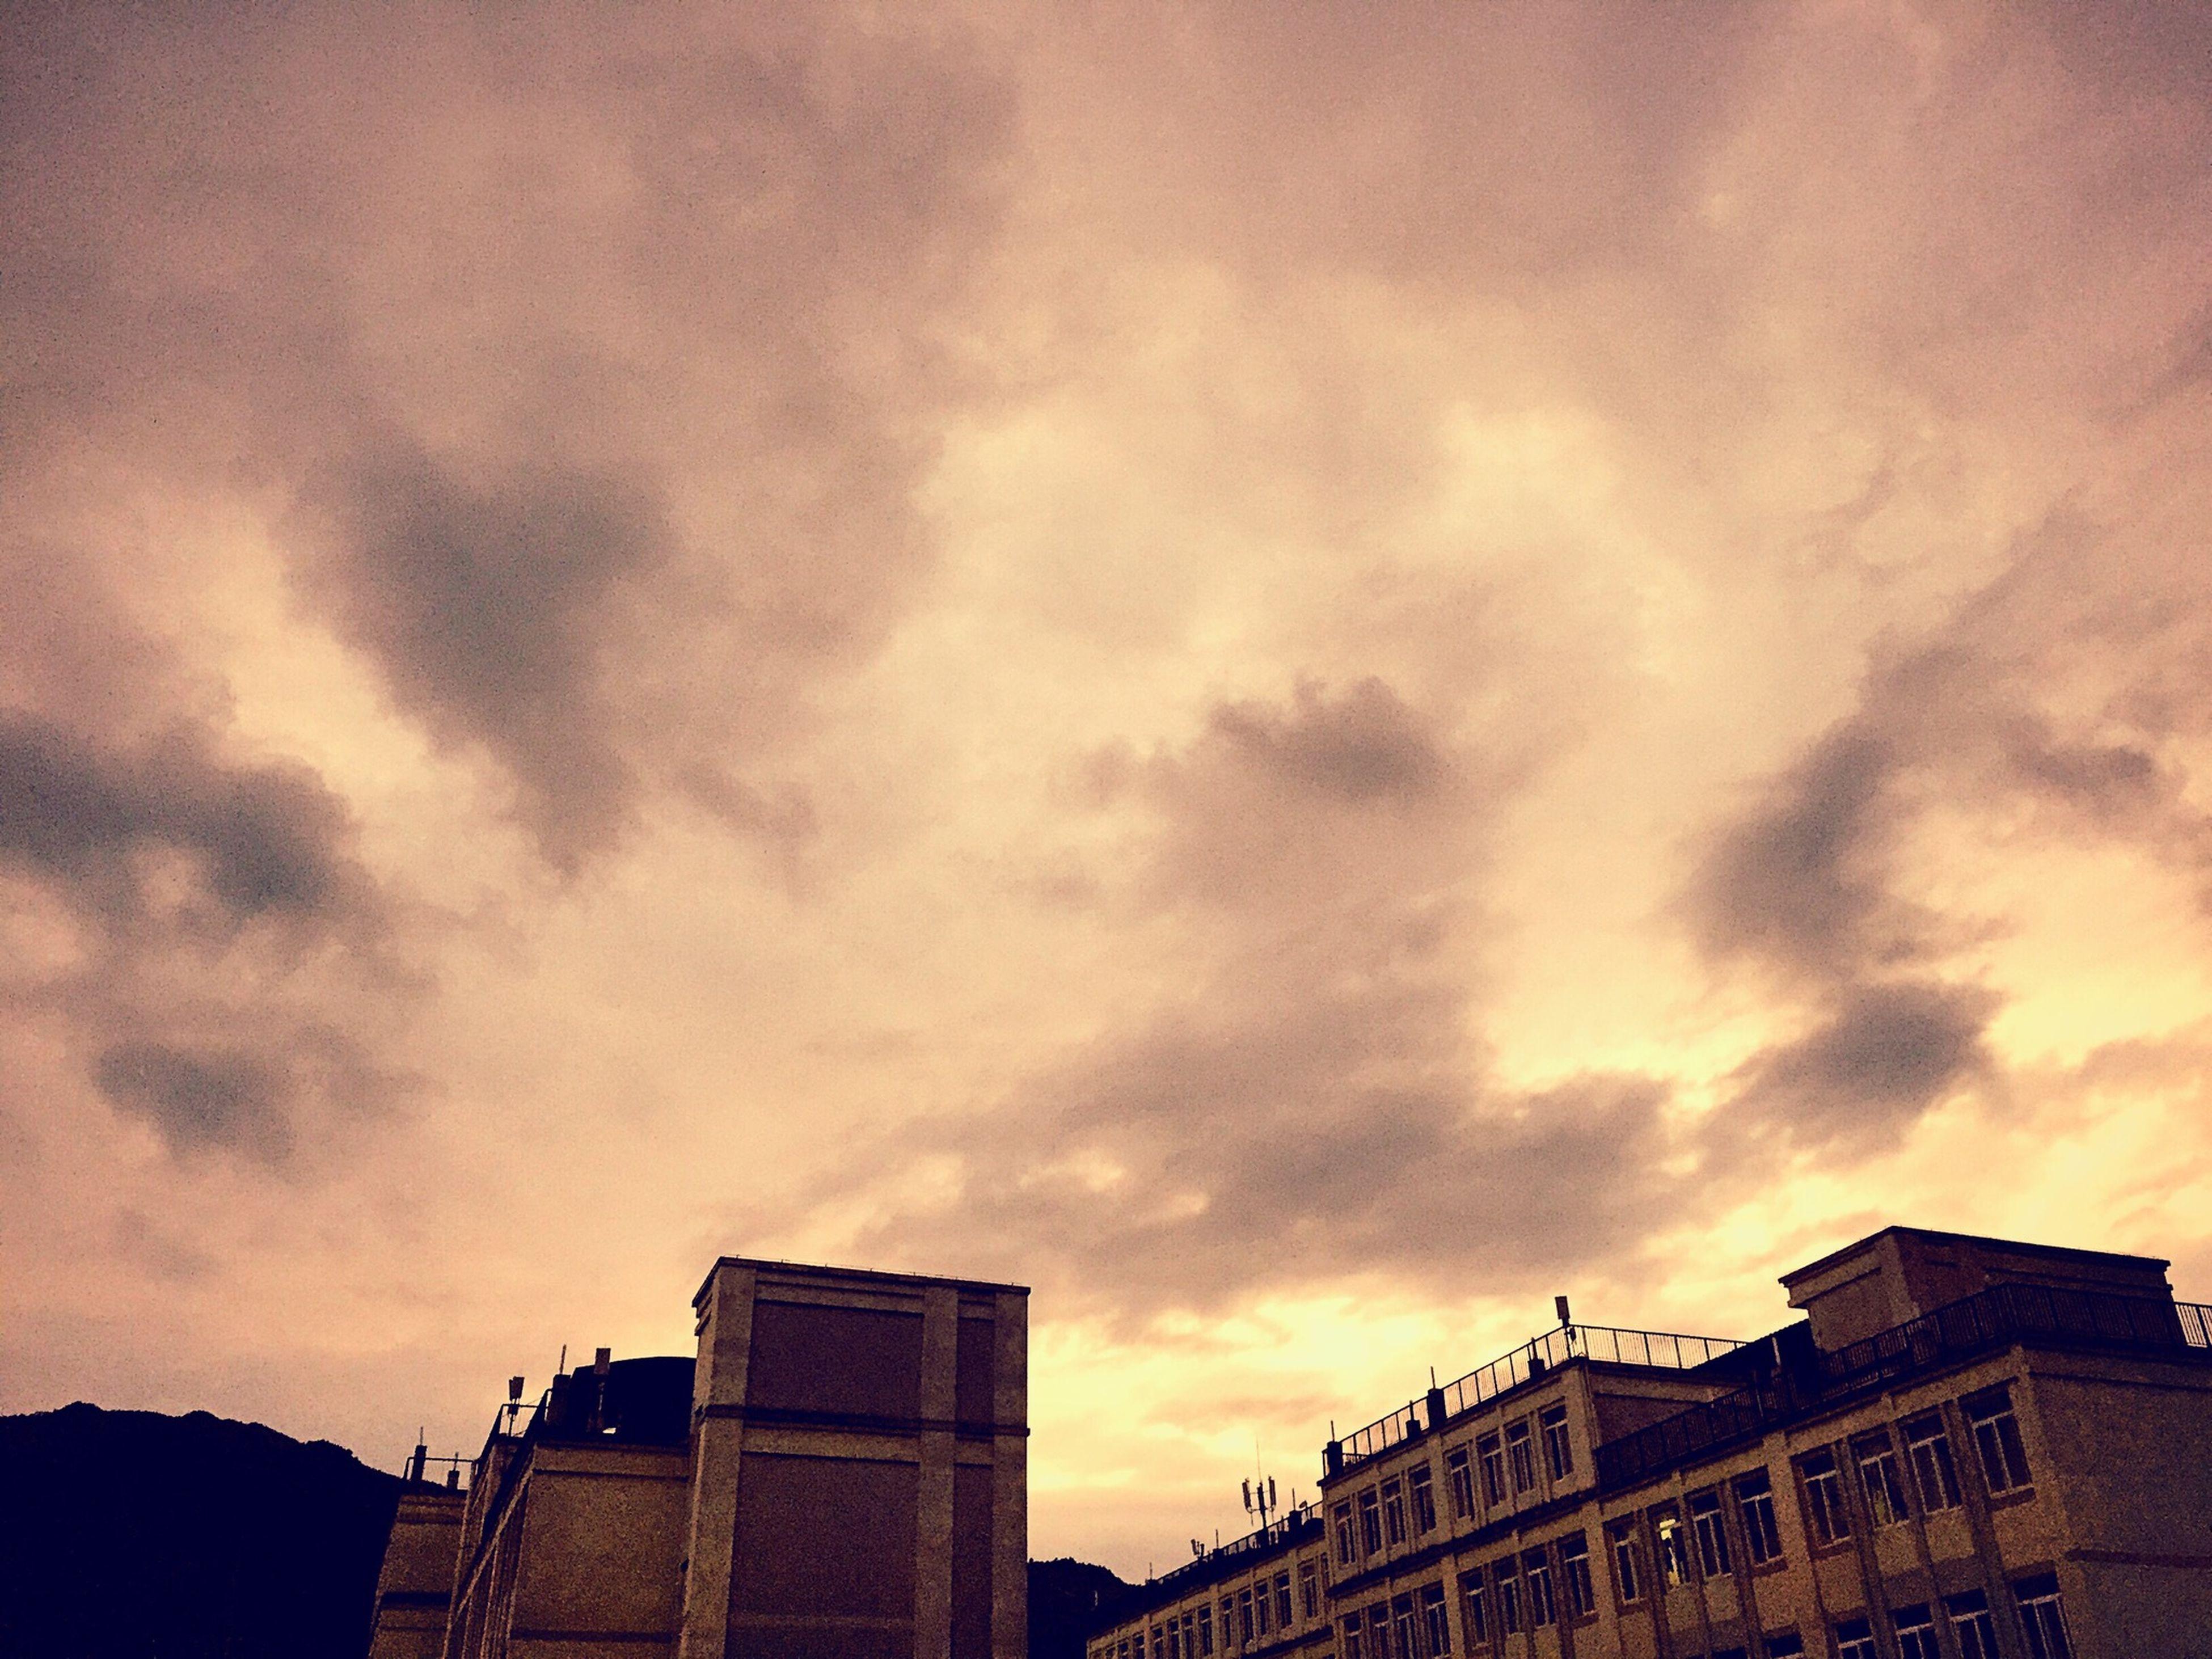 architecture, building exterior, built structure, low angle view, sky, cloud - sky, sunset, cloudy, silhouette, building, city, cloud, high section, overcast, residential building, residential structure, outdoors, weather, orange color, dusk